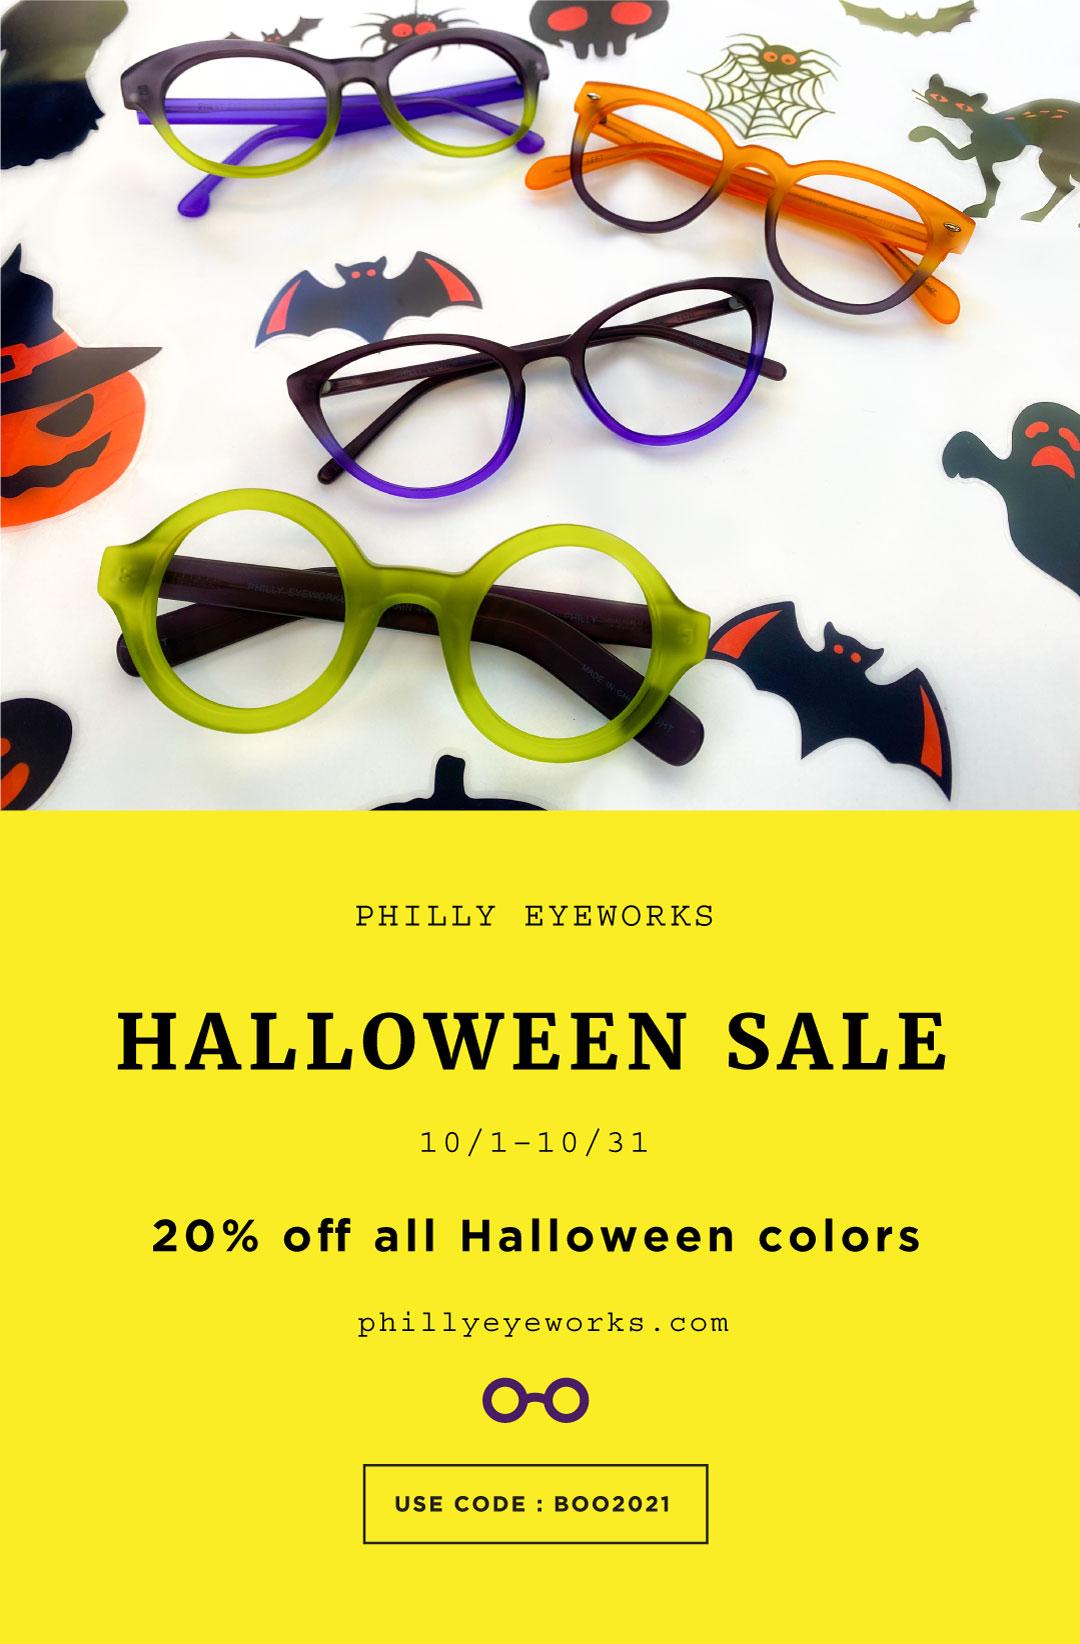 Halloween Sale. 10/1-10/31. 20% off all Halloween colors. Use code BOO2021.